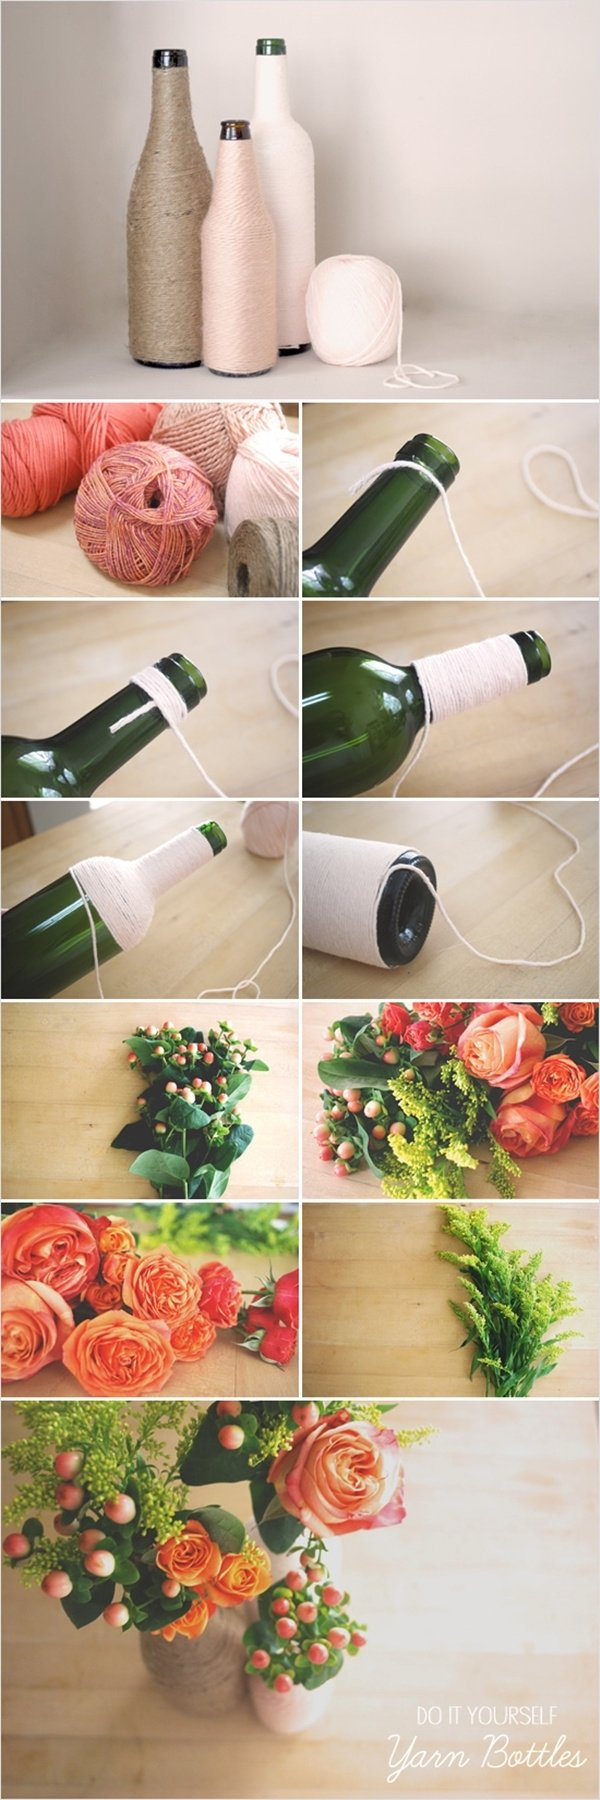 10 Fabulous Spring Wedding Ideas On A Budget 20 creative diy wedding ideas for 2016 spring